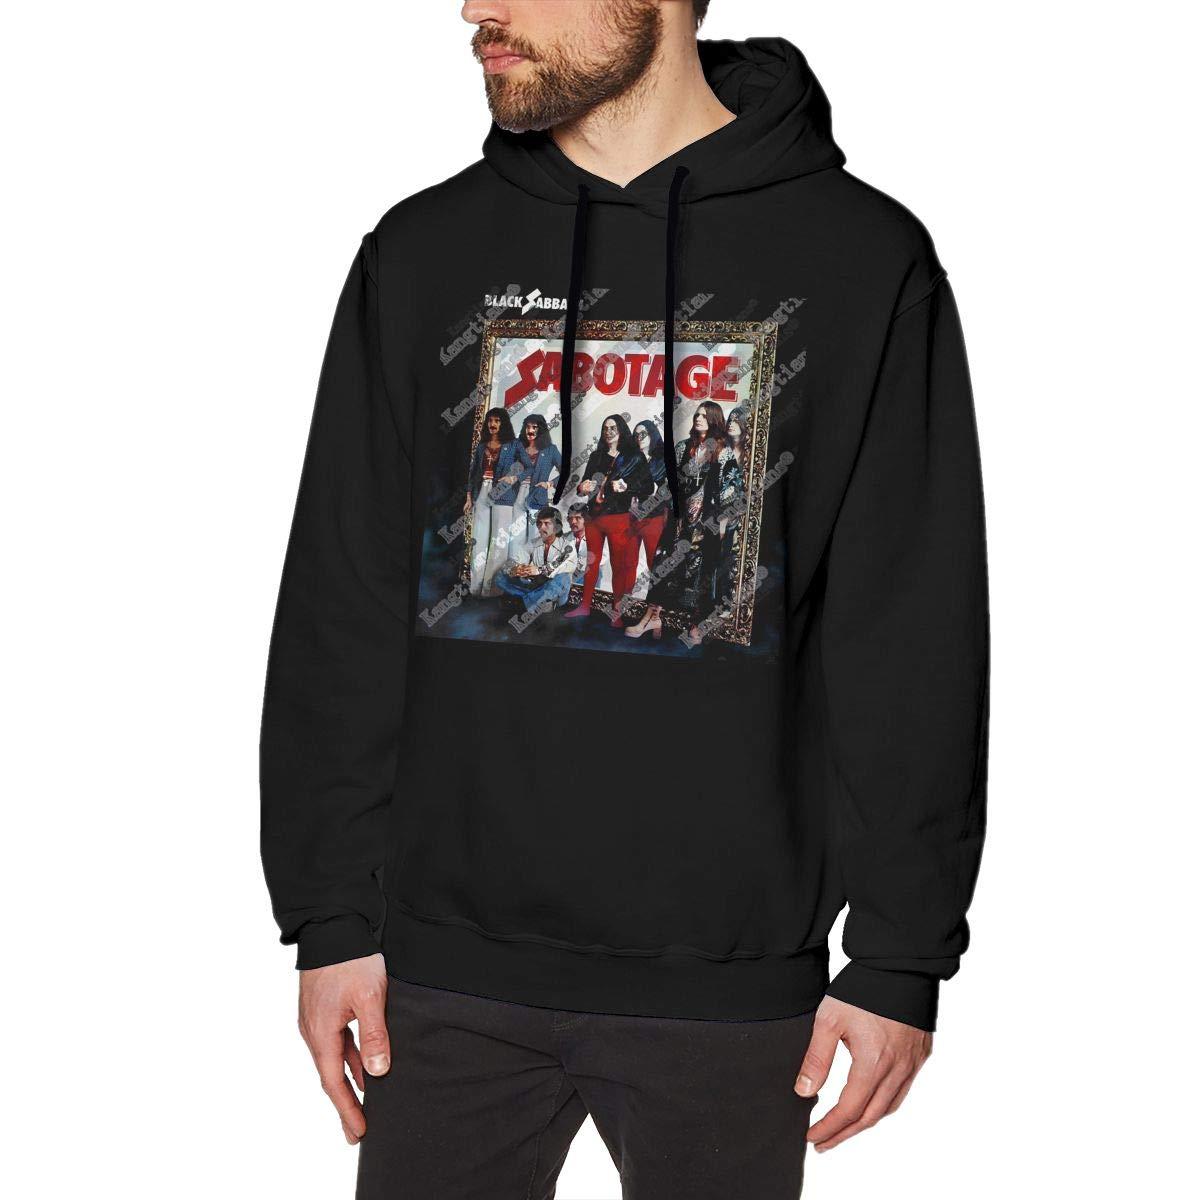 Chunt S Black Sabbath Sabotage Hooded Art No Pocket Black Shirts